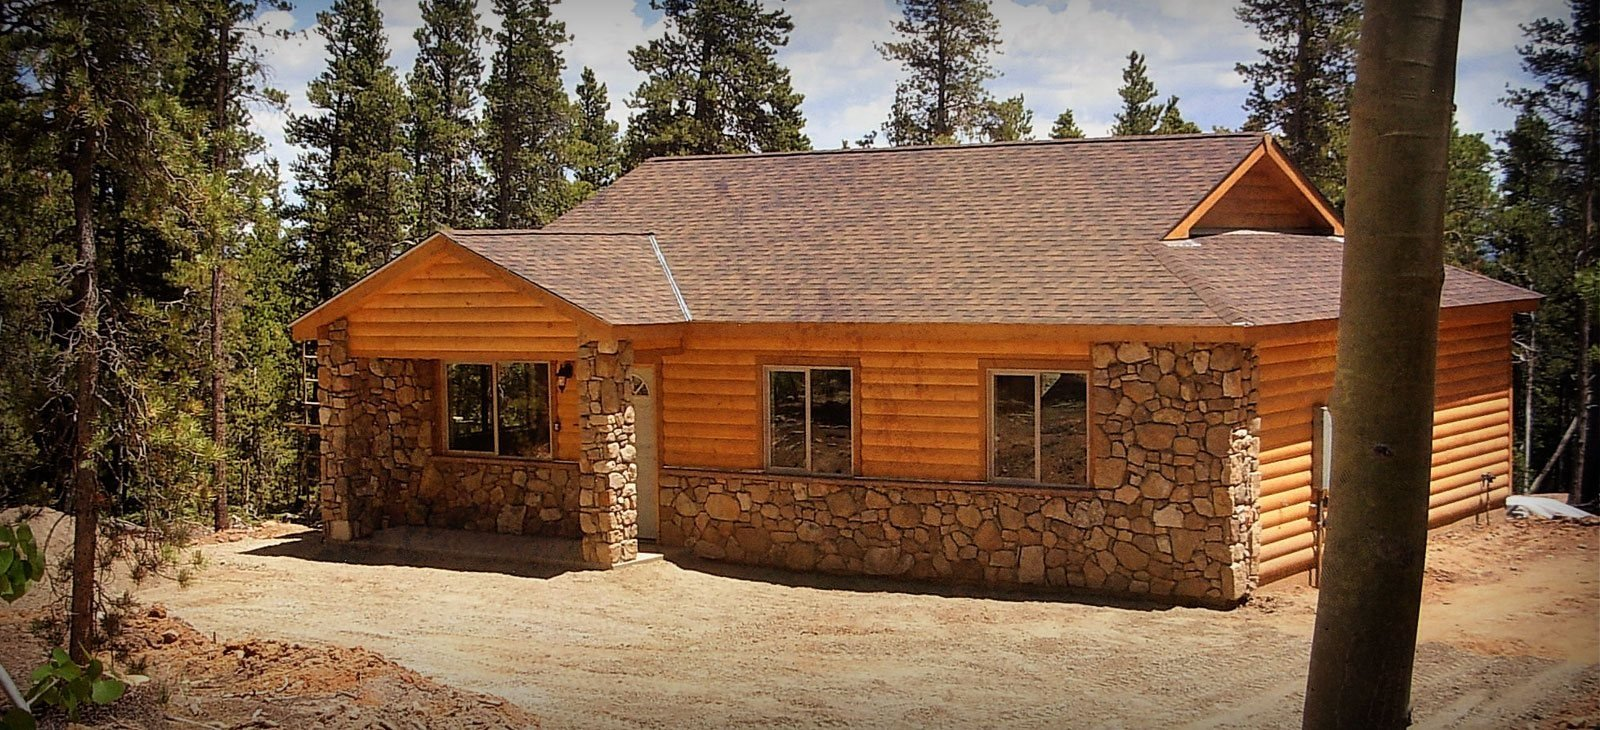 Wooden brick house design